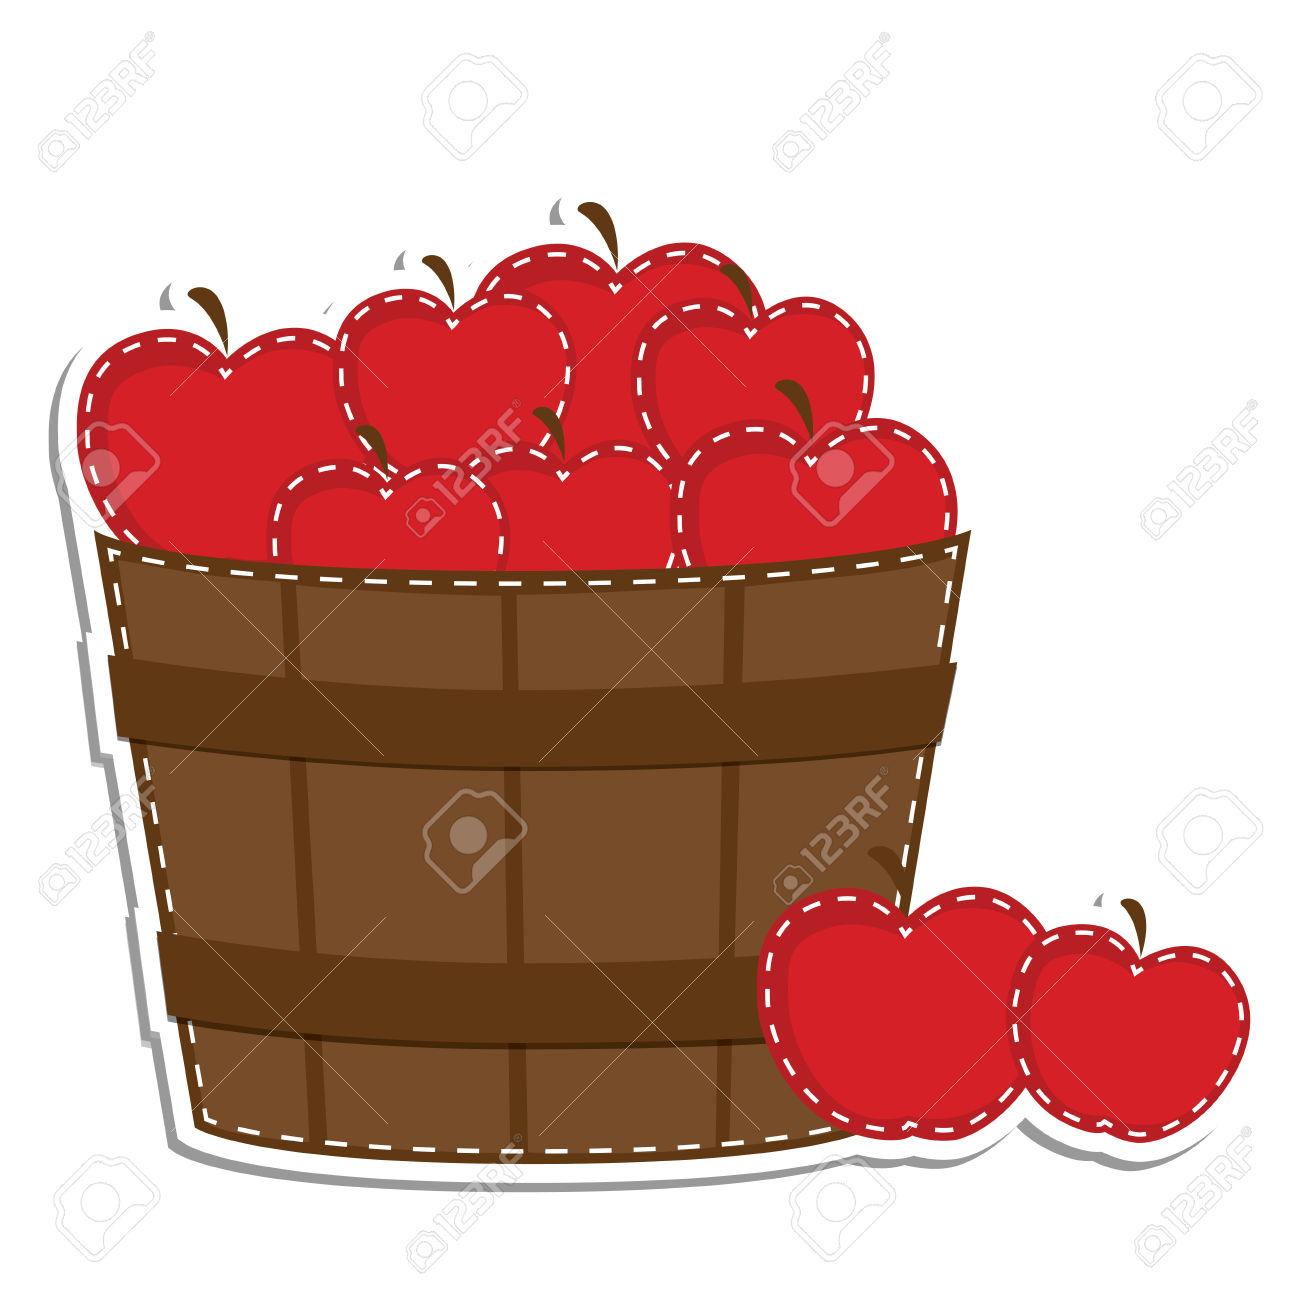 Apple basket clipart no background.